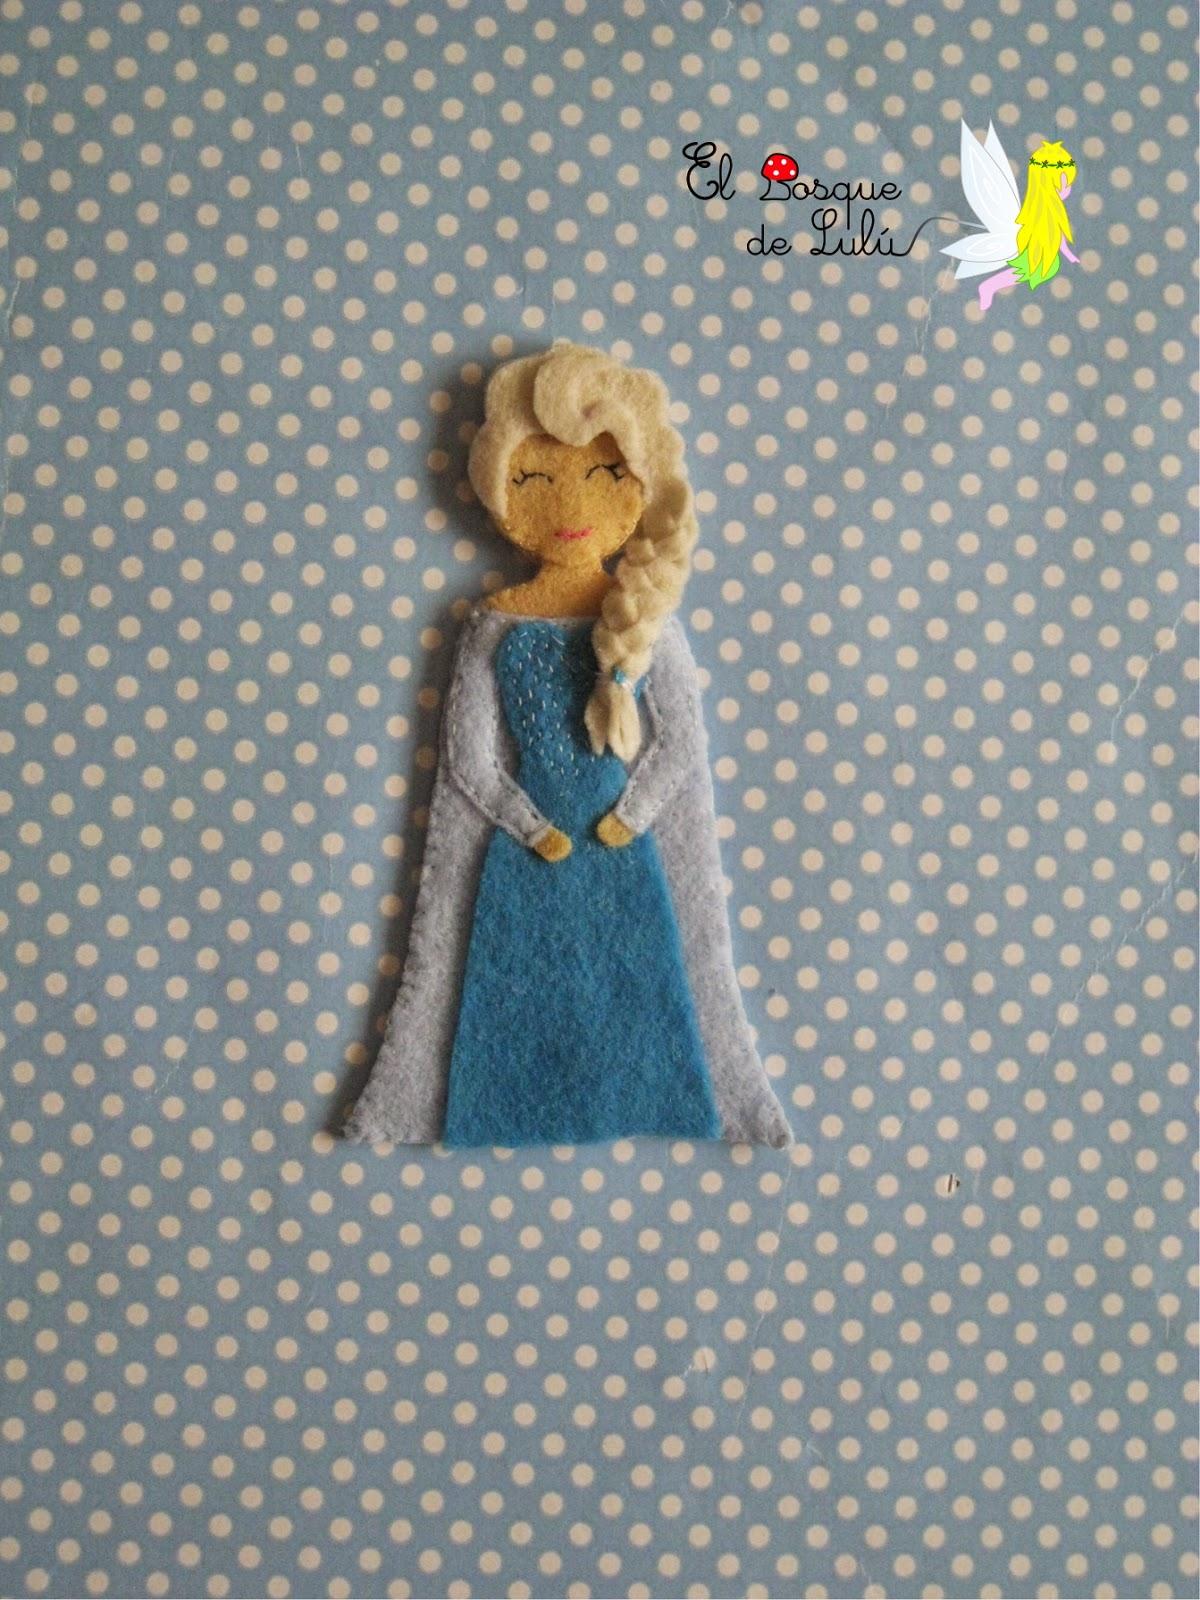 diadema-Frozen-fieltro-diadema-Elsa-Disney-regalo-personalizado